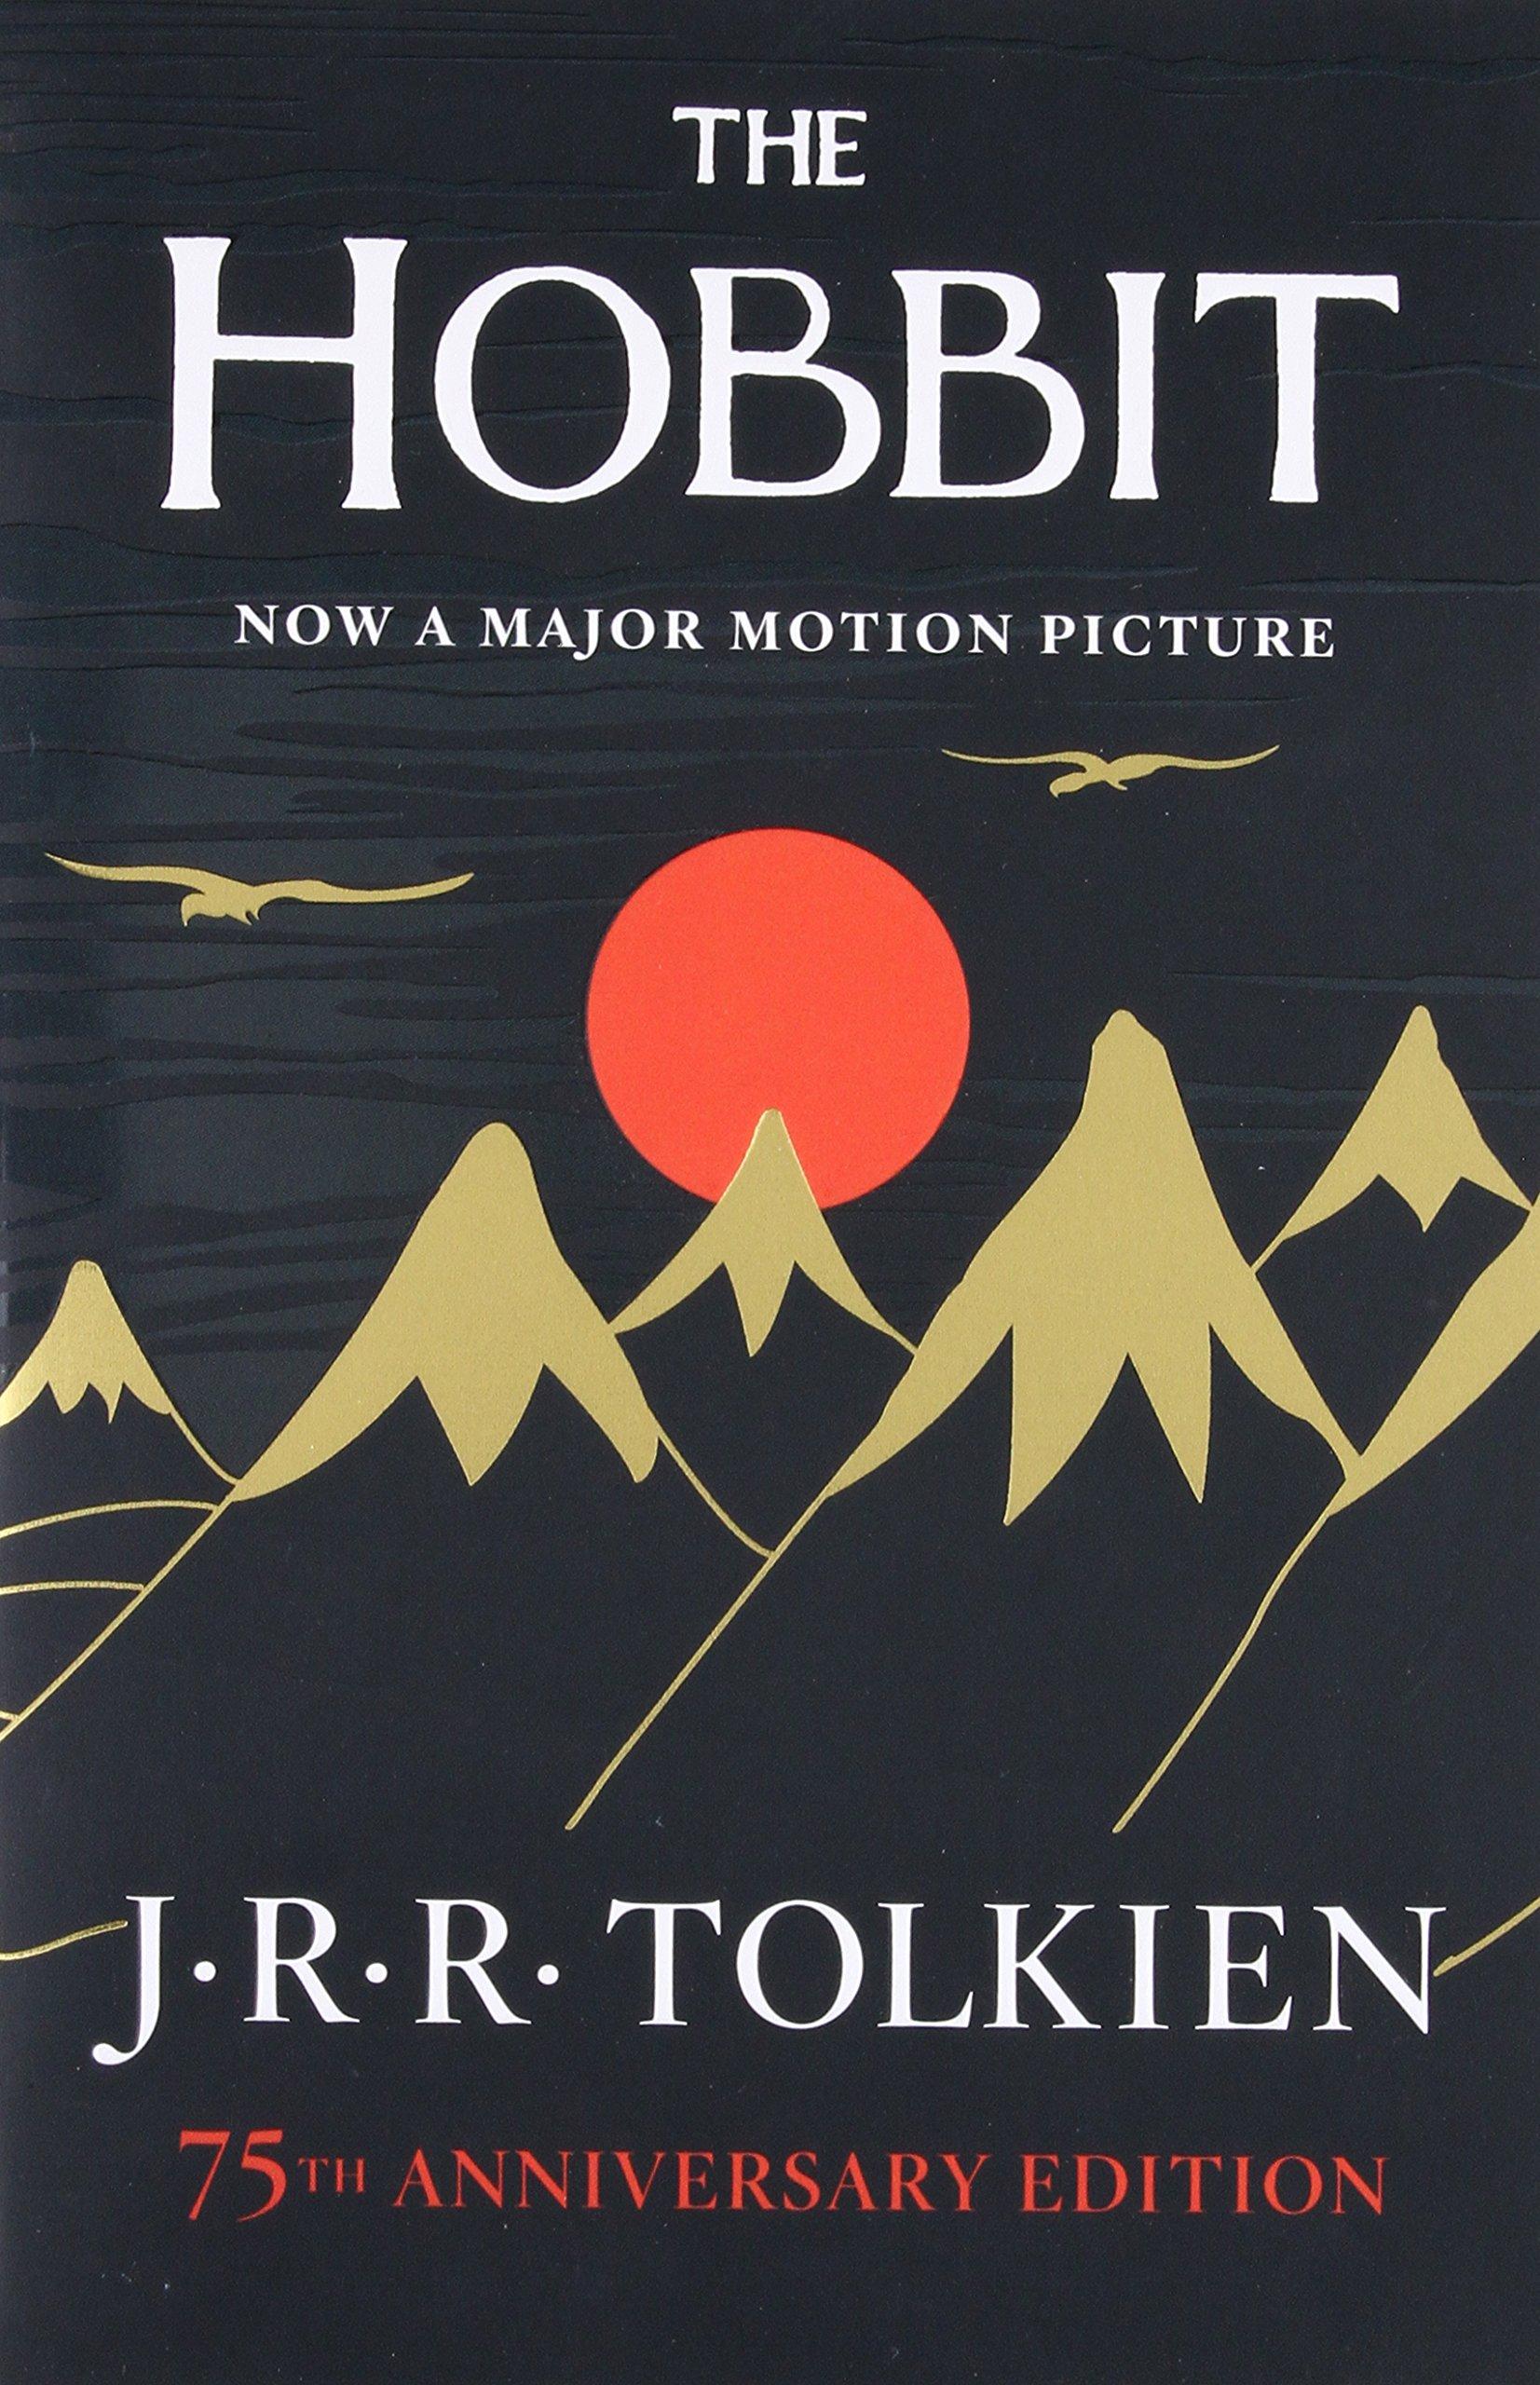 famous covers hobbit itself speak ll let tag